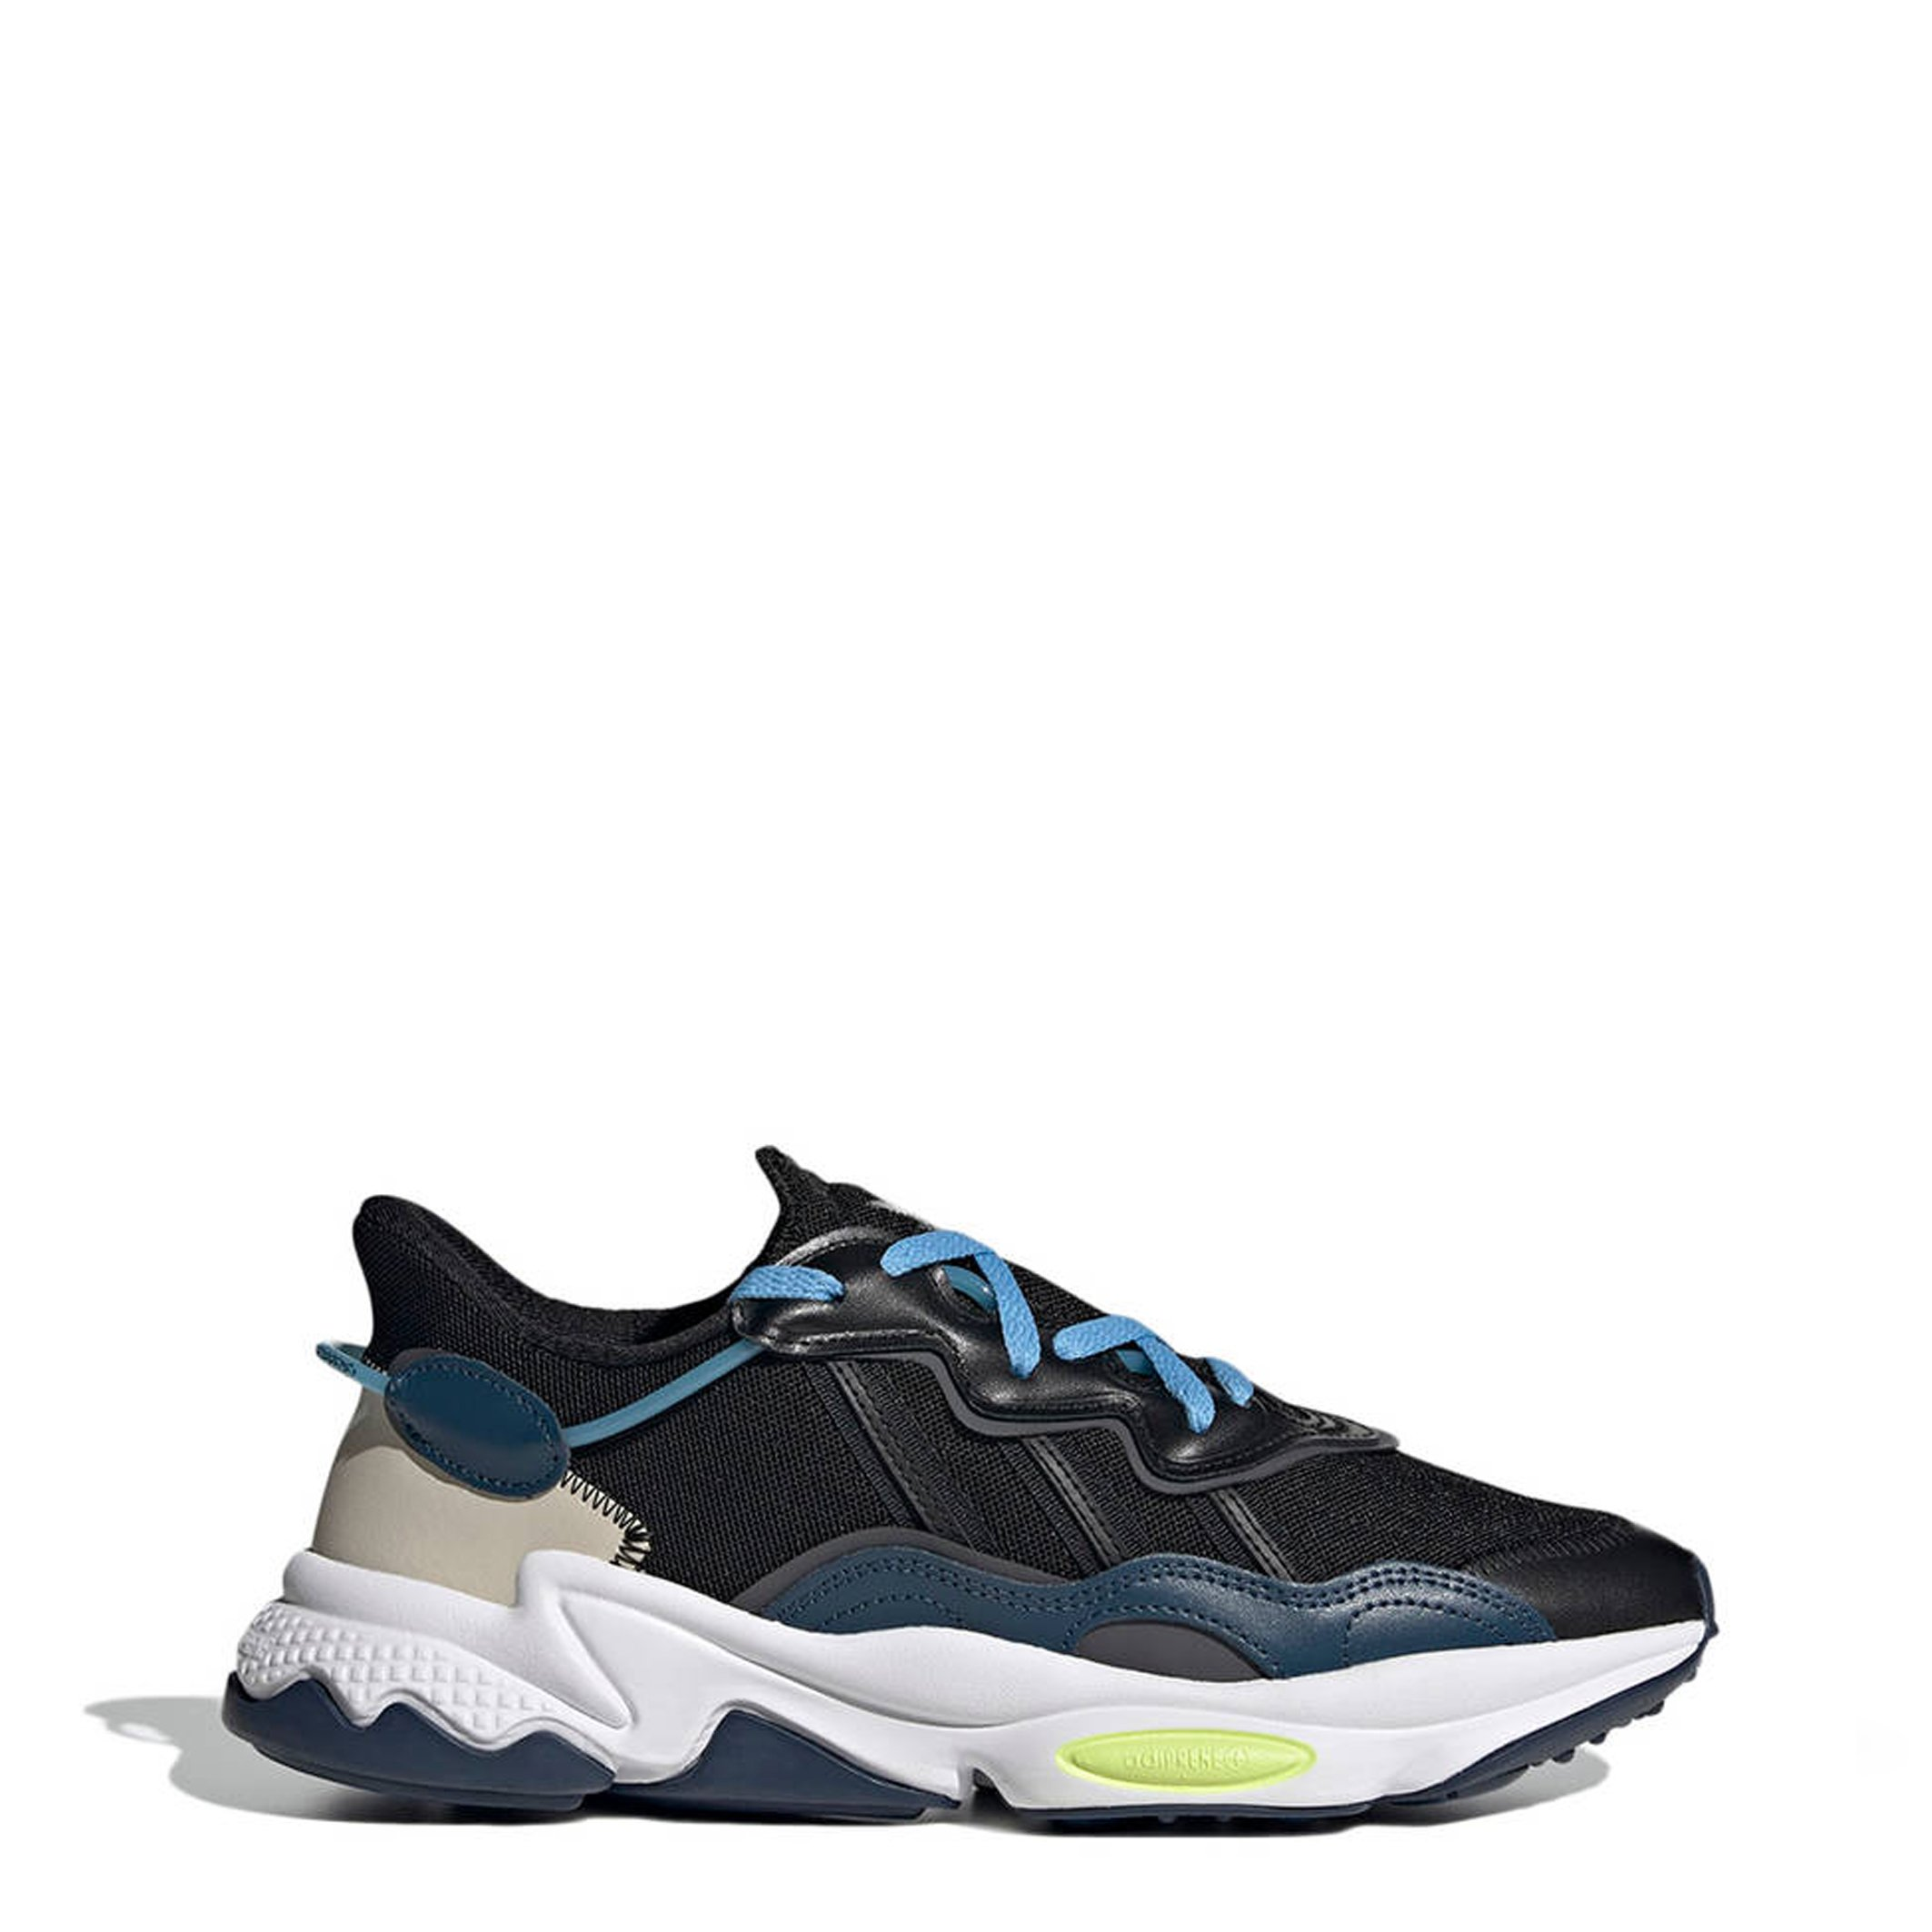 Adidas Unisex Ozweego Trainers Various Colours EE6466 - black-1 UK 11.0